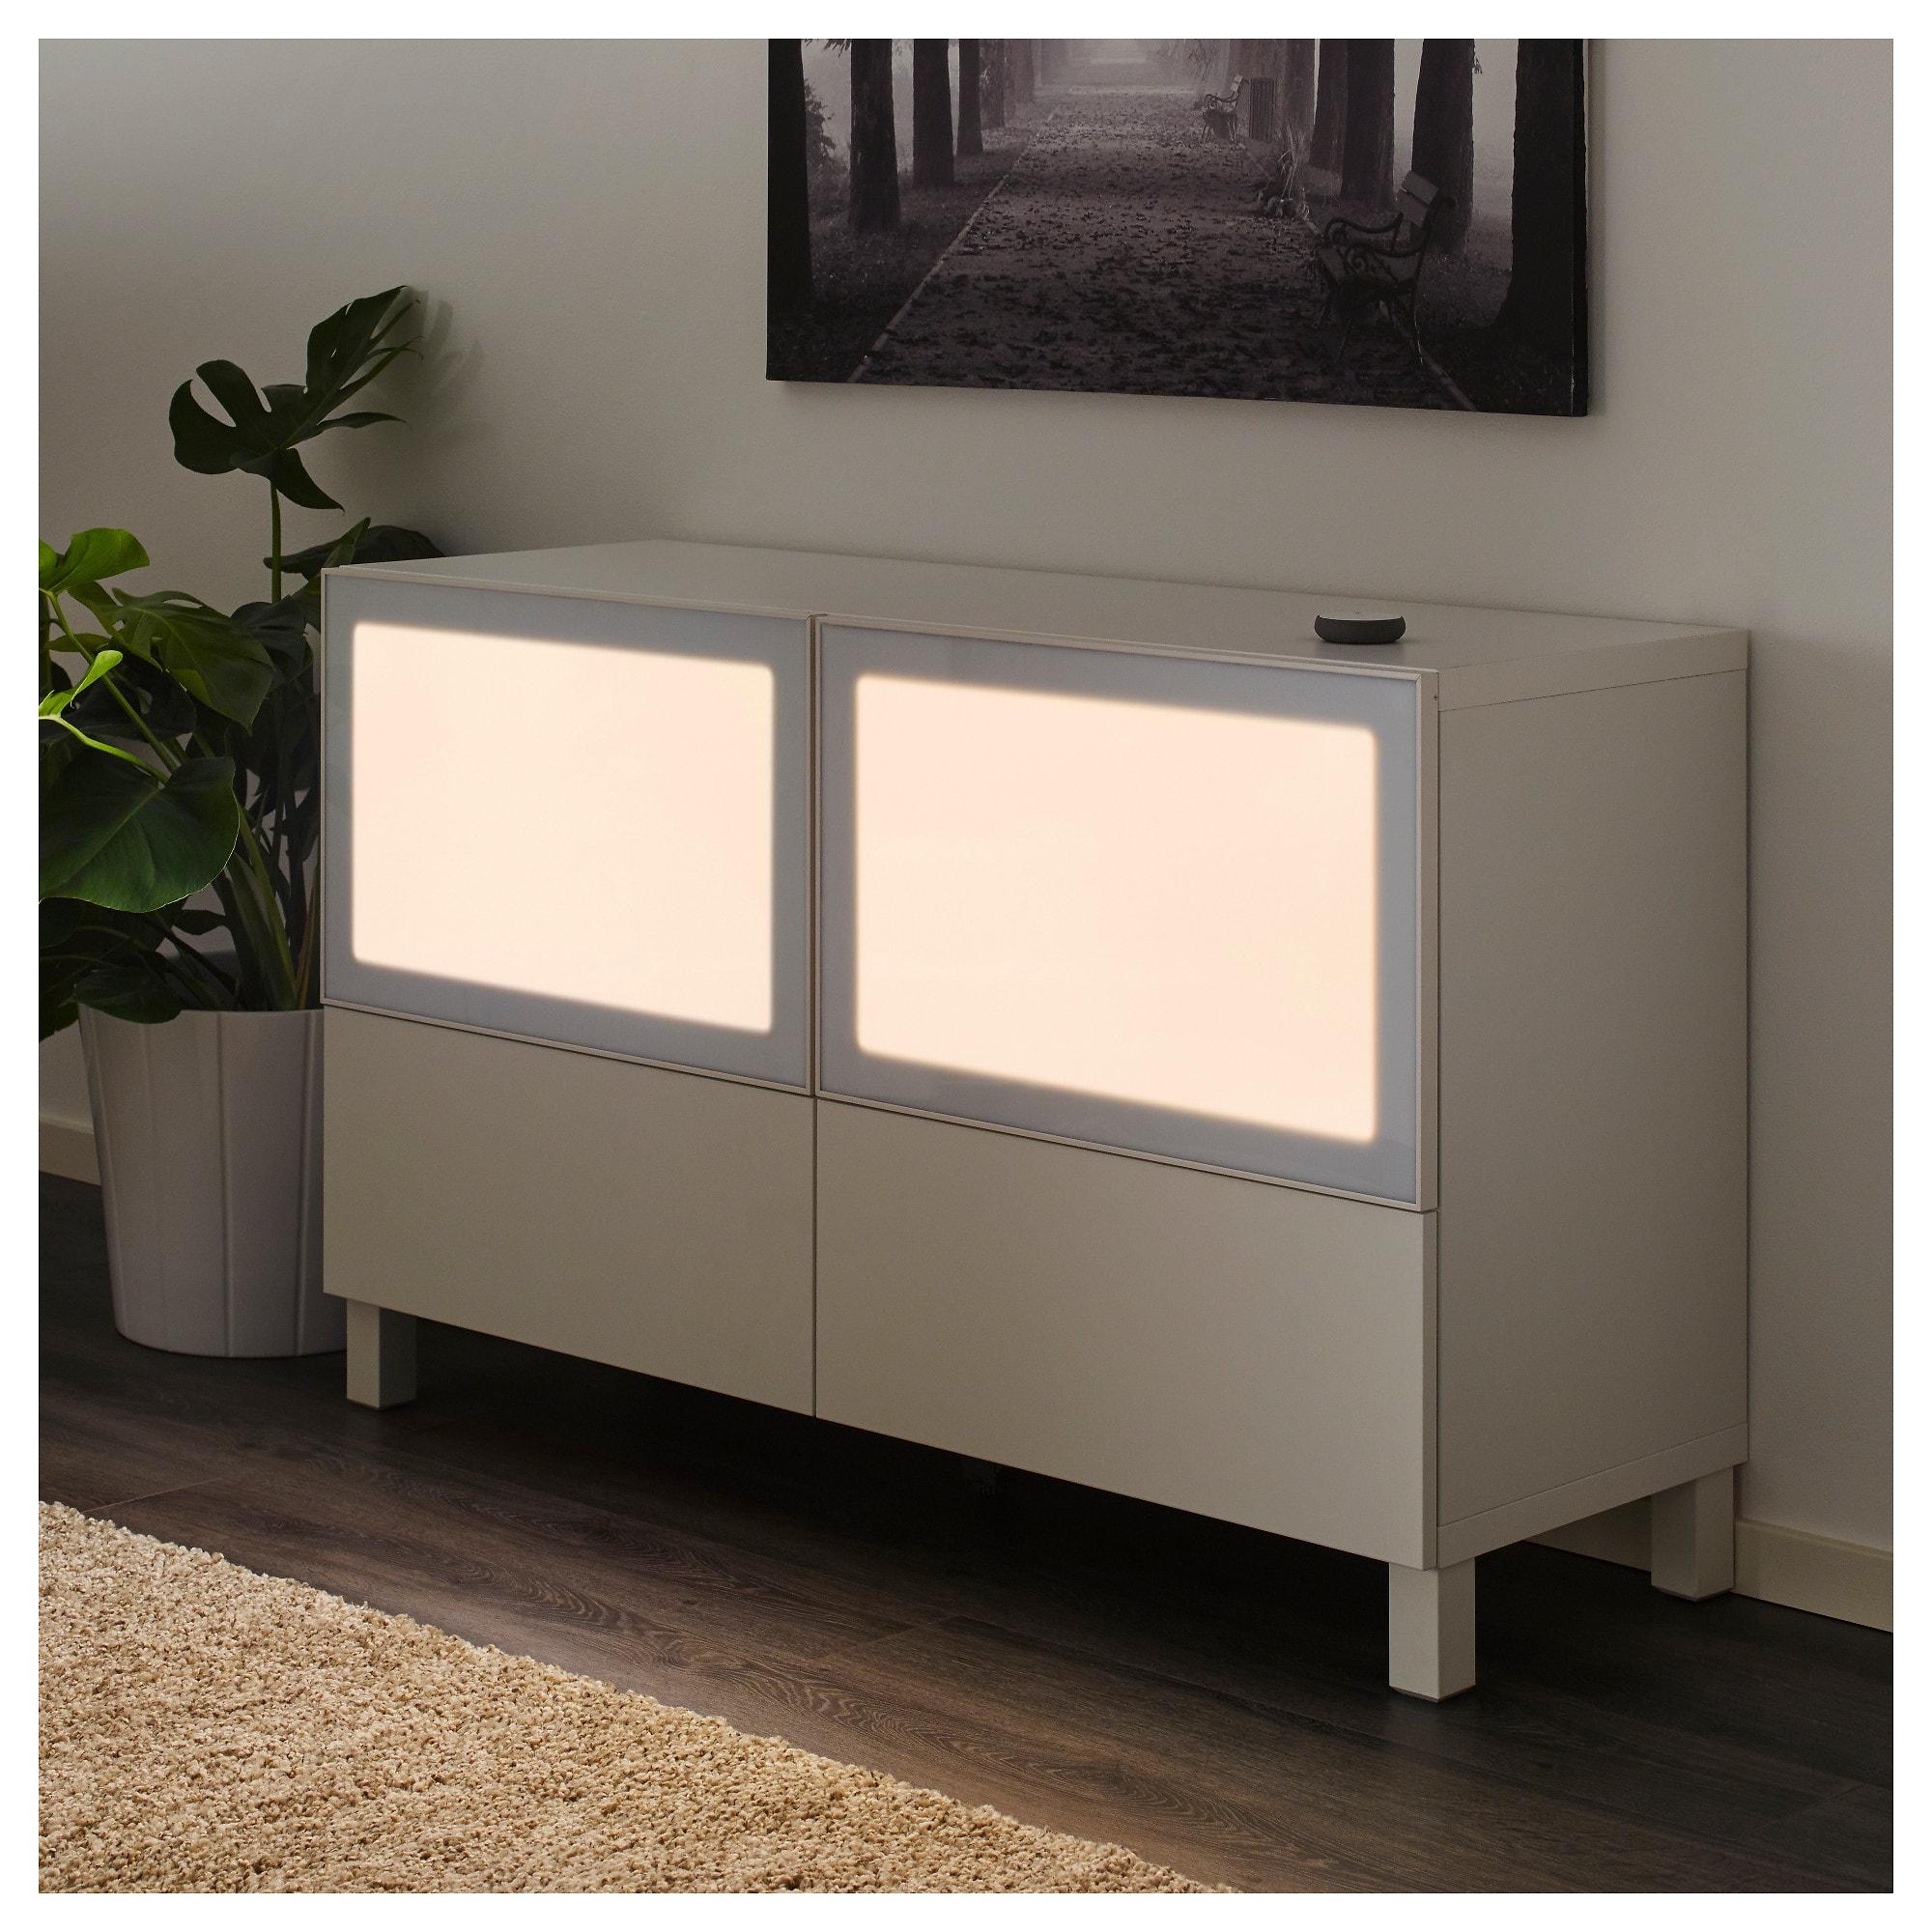 SURTE LED light door w wireless control, dimmable, white spectrum, 60x38 cm